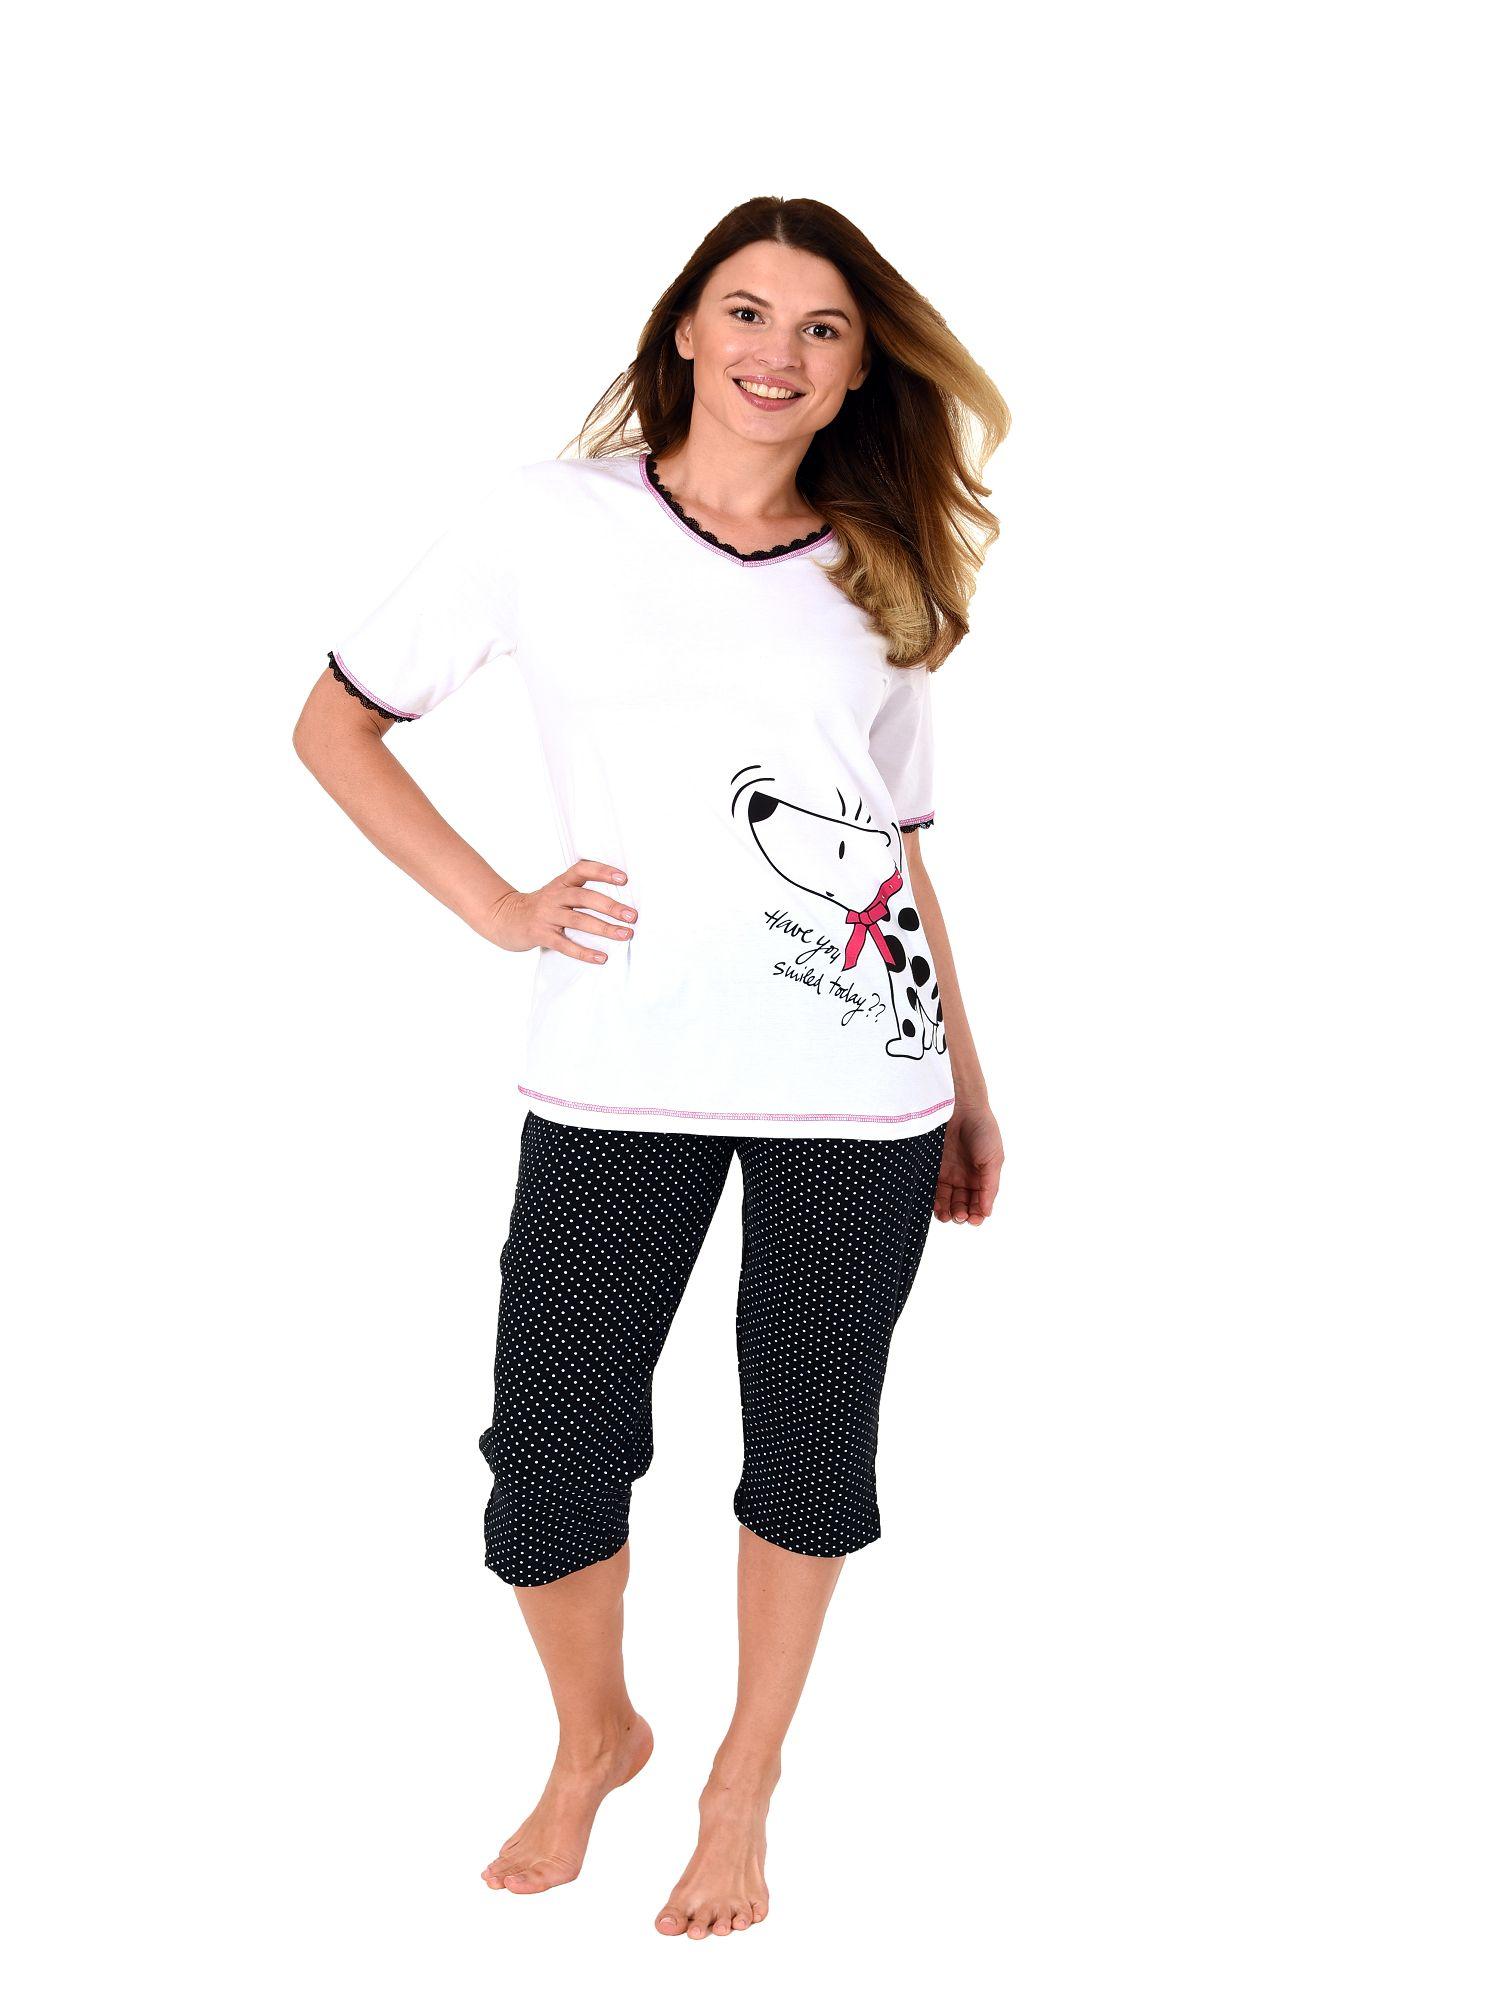 Damen Capri Pyjama kurzarm Hundemotiv, 3/4-Hose Tupfen – auch in Übergrössen 204 90 004 – Bild 2